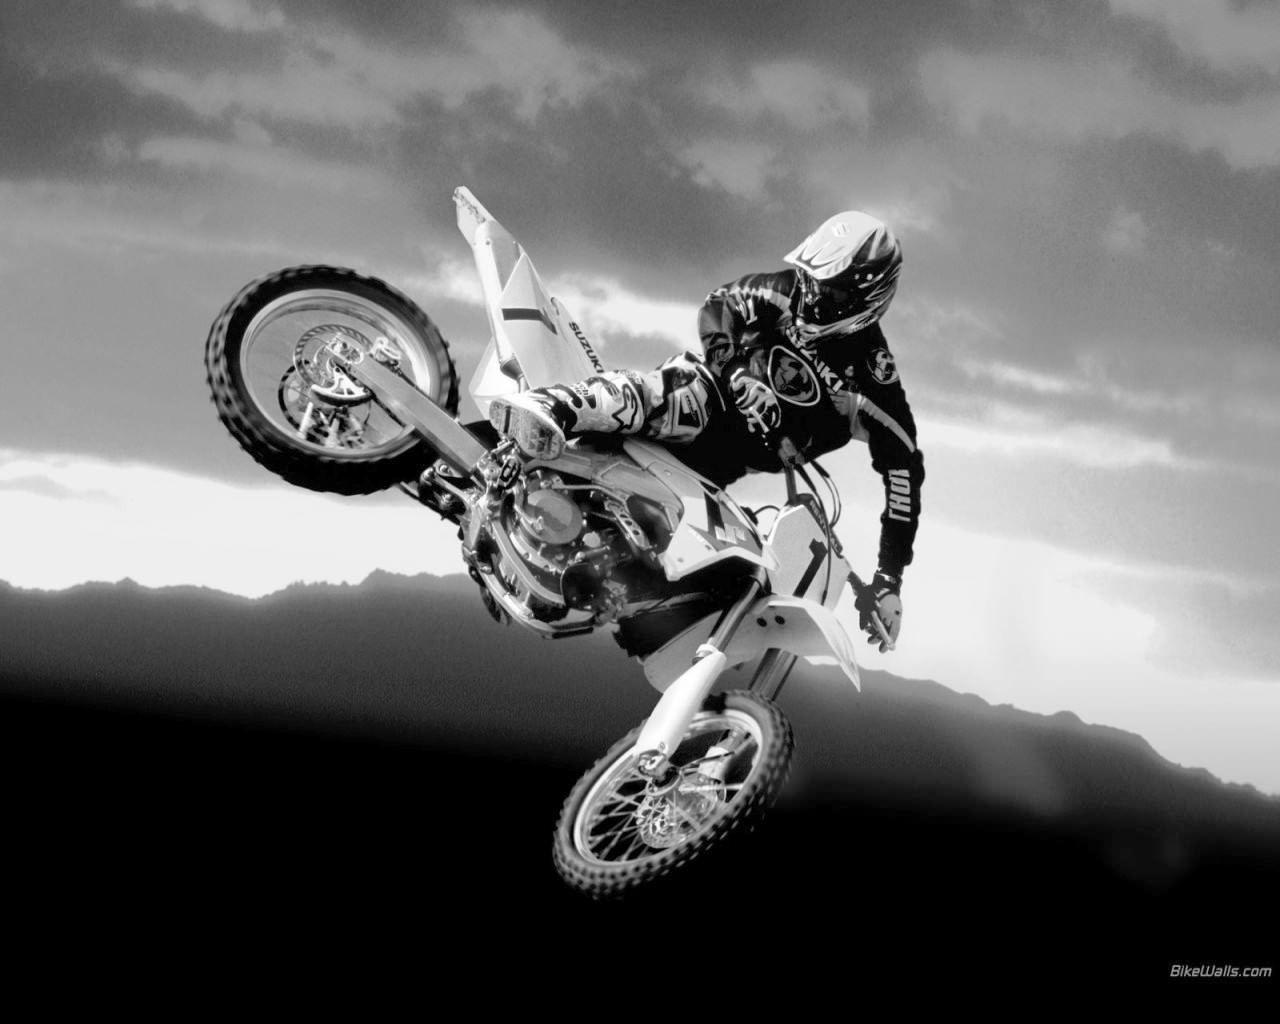 Motocross Bikes Wallpapers - Wallpaper Cave